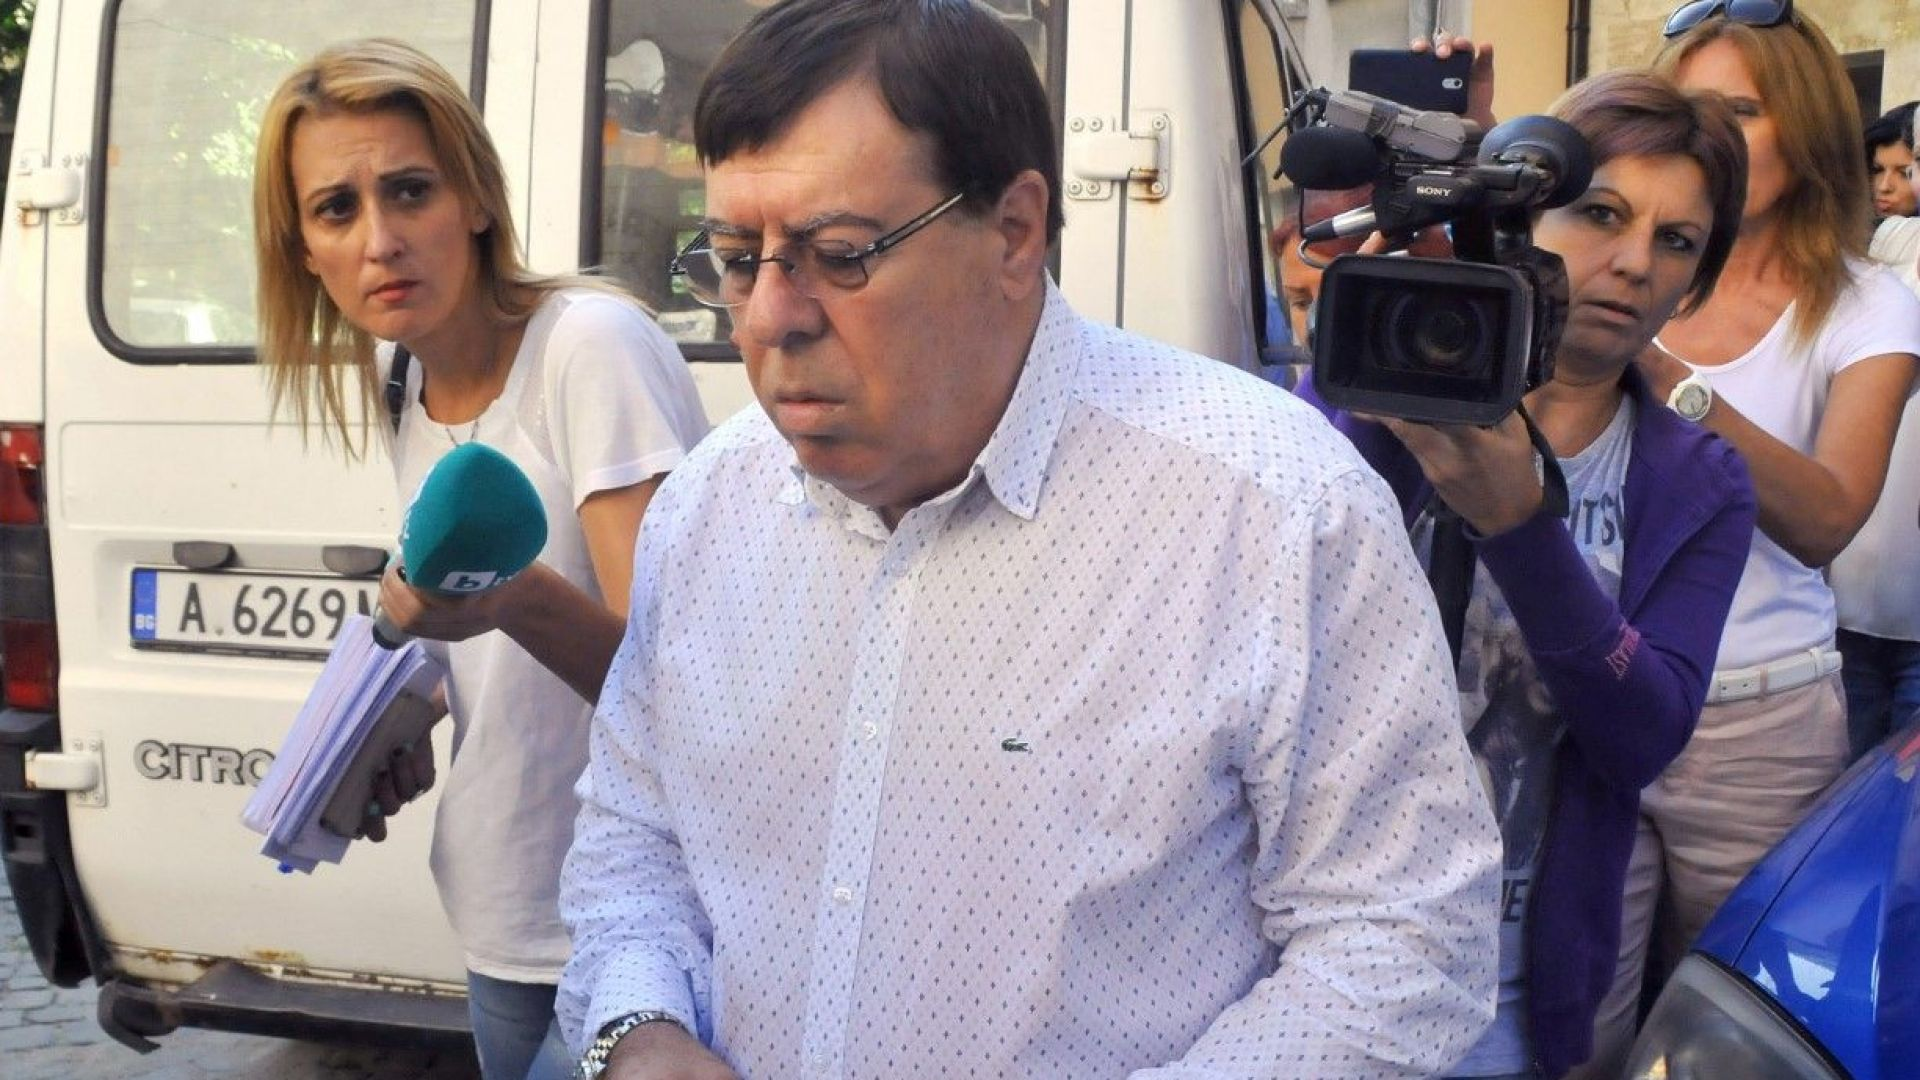 Внесоха в съда обвинителния акт срещу общинаря Бенчо Бенчев, помагал на Митьо Очите